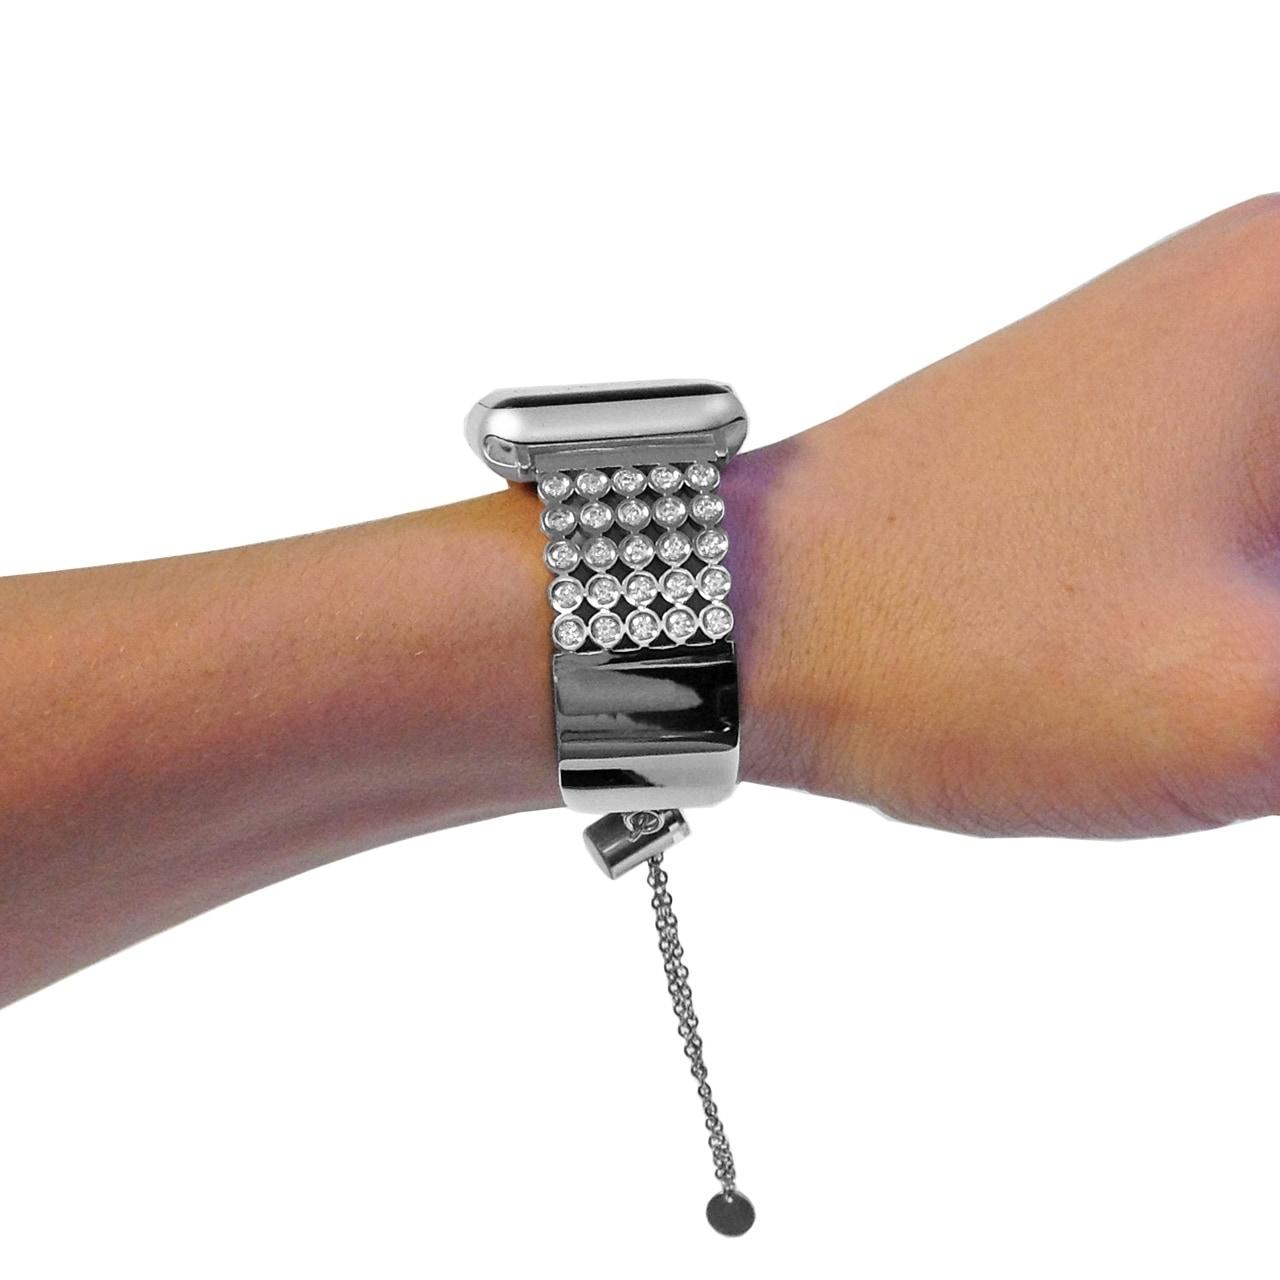 0bdb05aa78 Swarovski Crystal Apple Watch Band in Silver